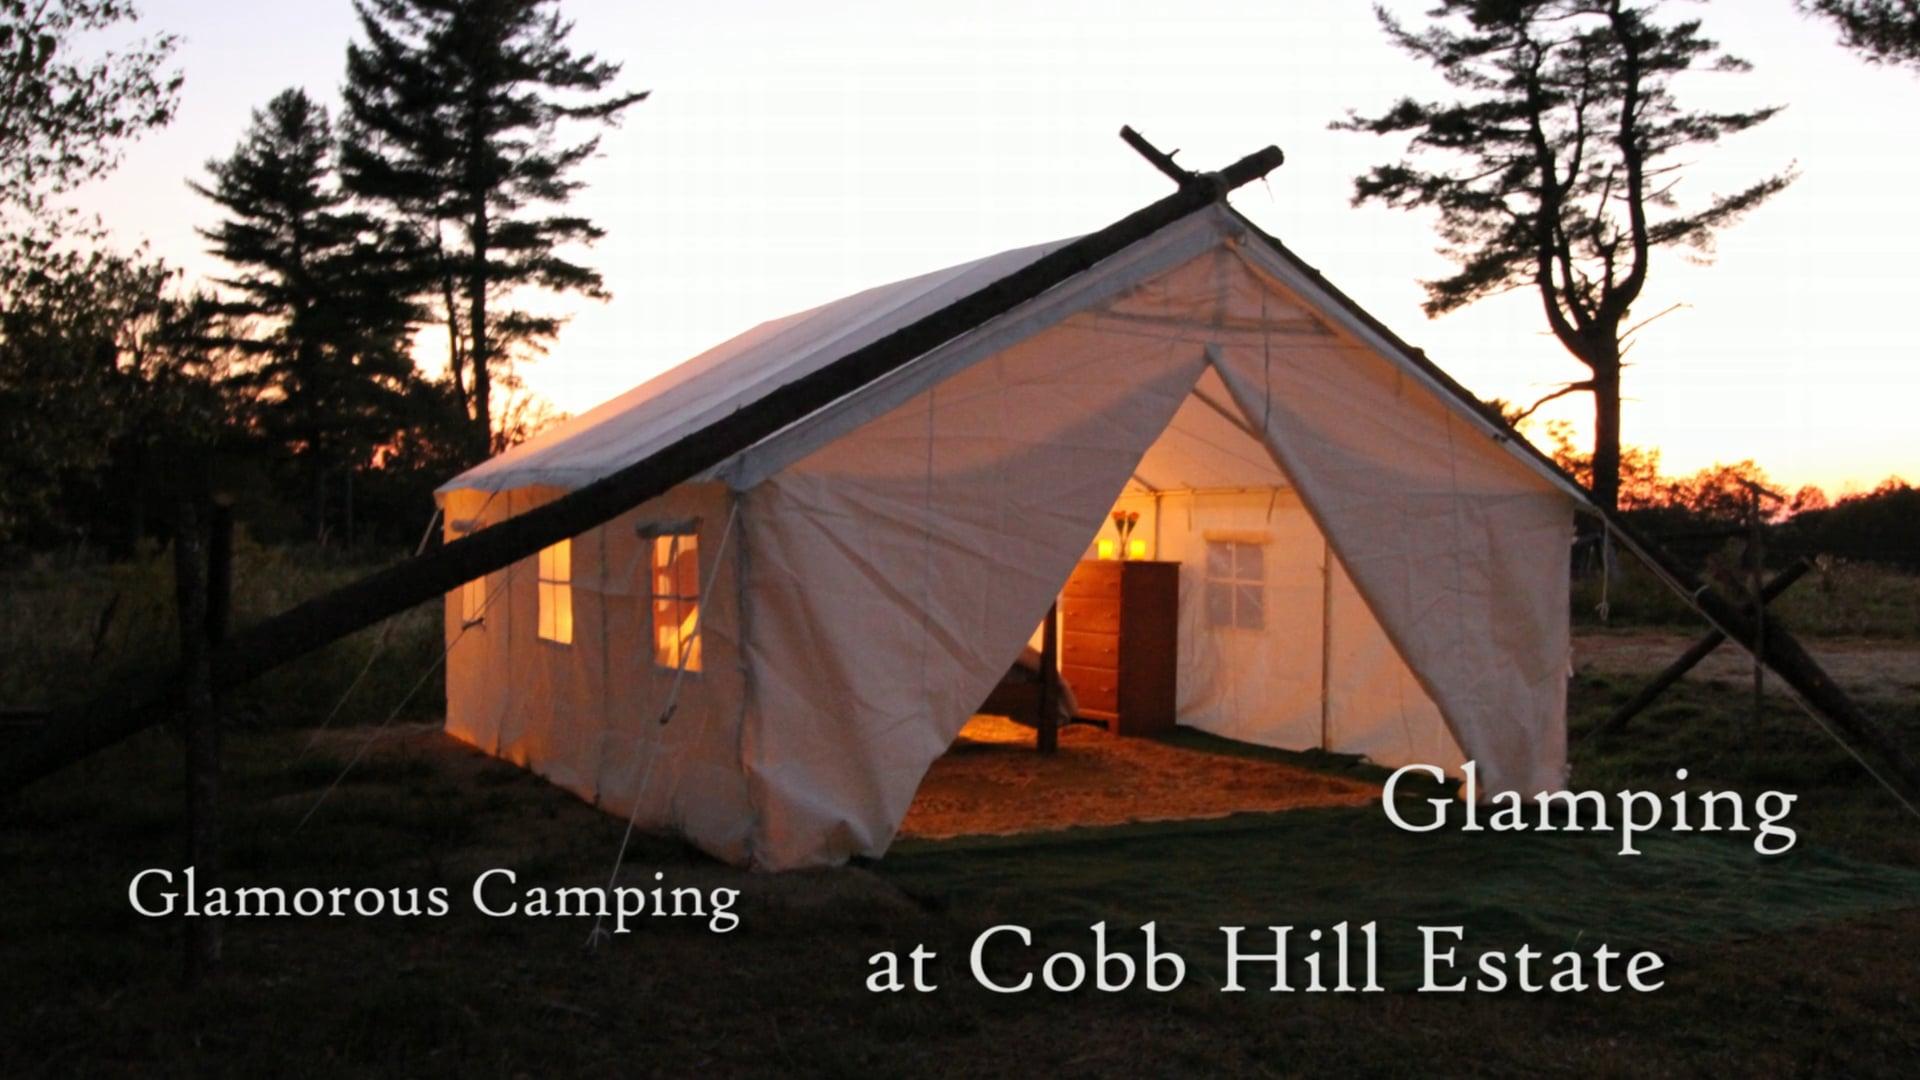 Cobb Hill Glamping